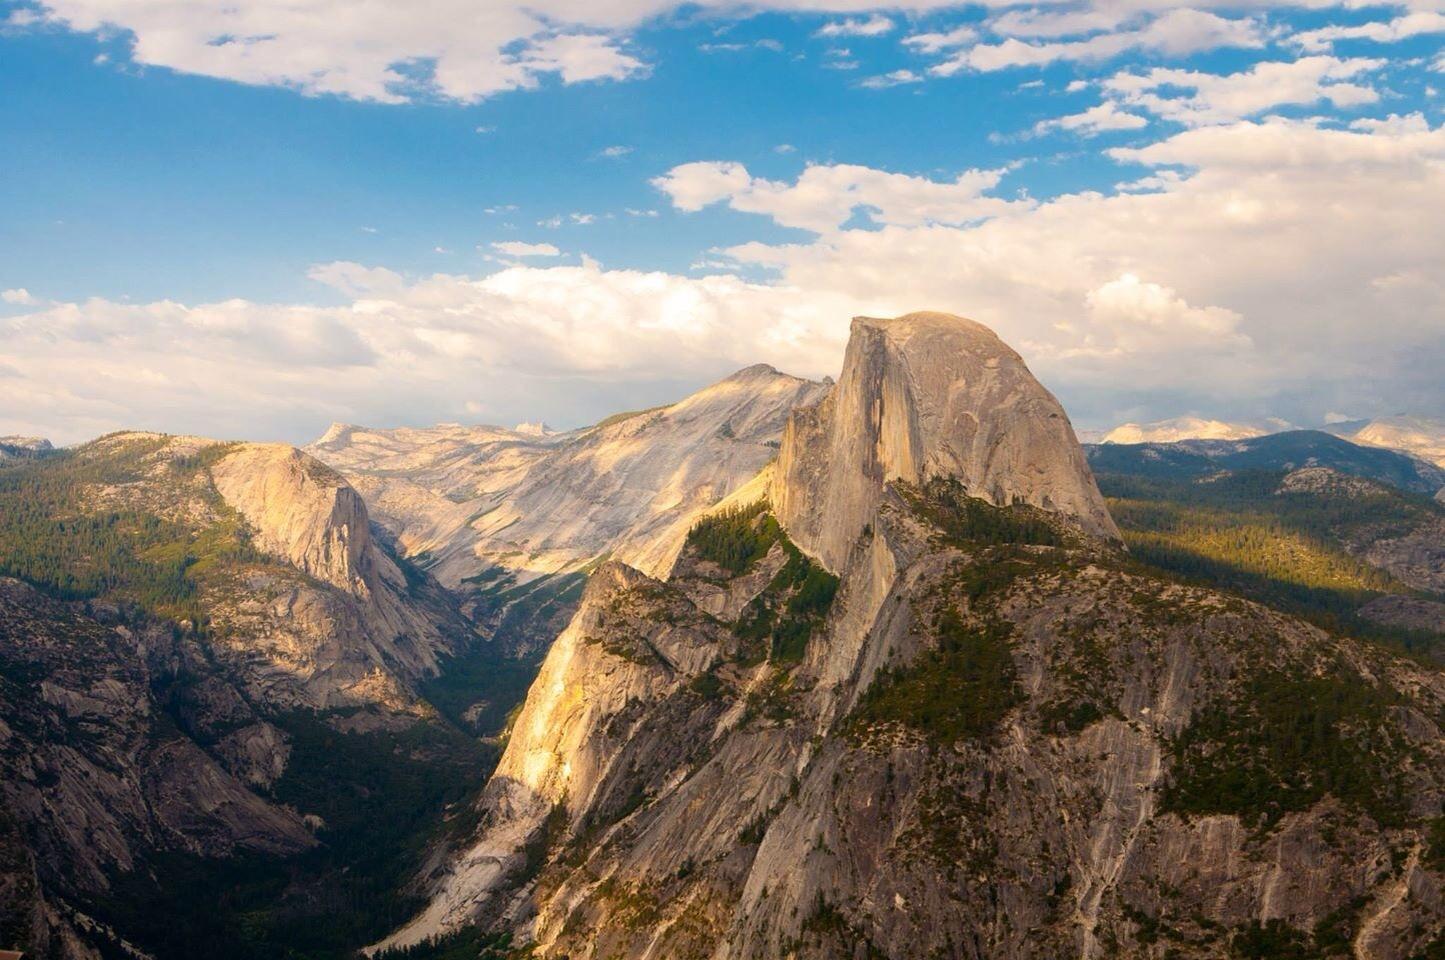 Overlooking Yosemite national park, CA by Ben Karpinski